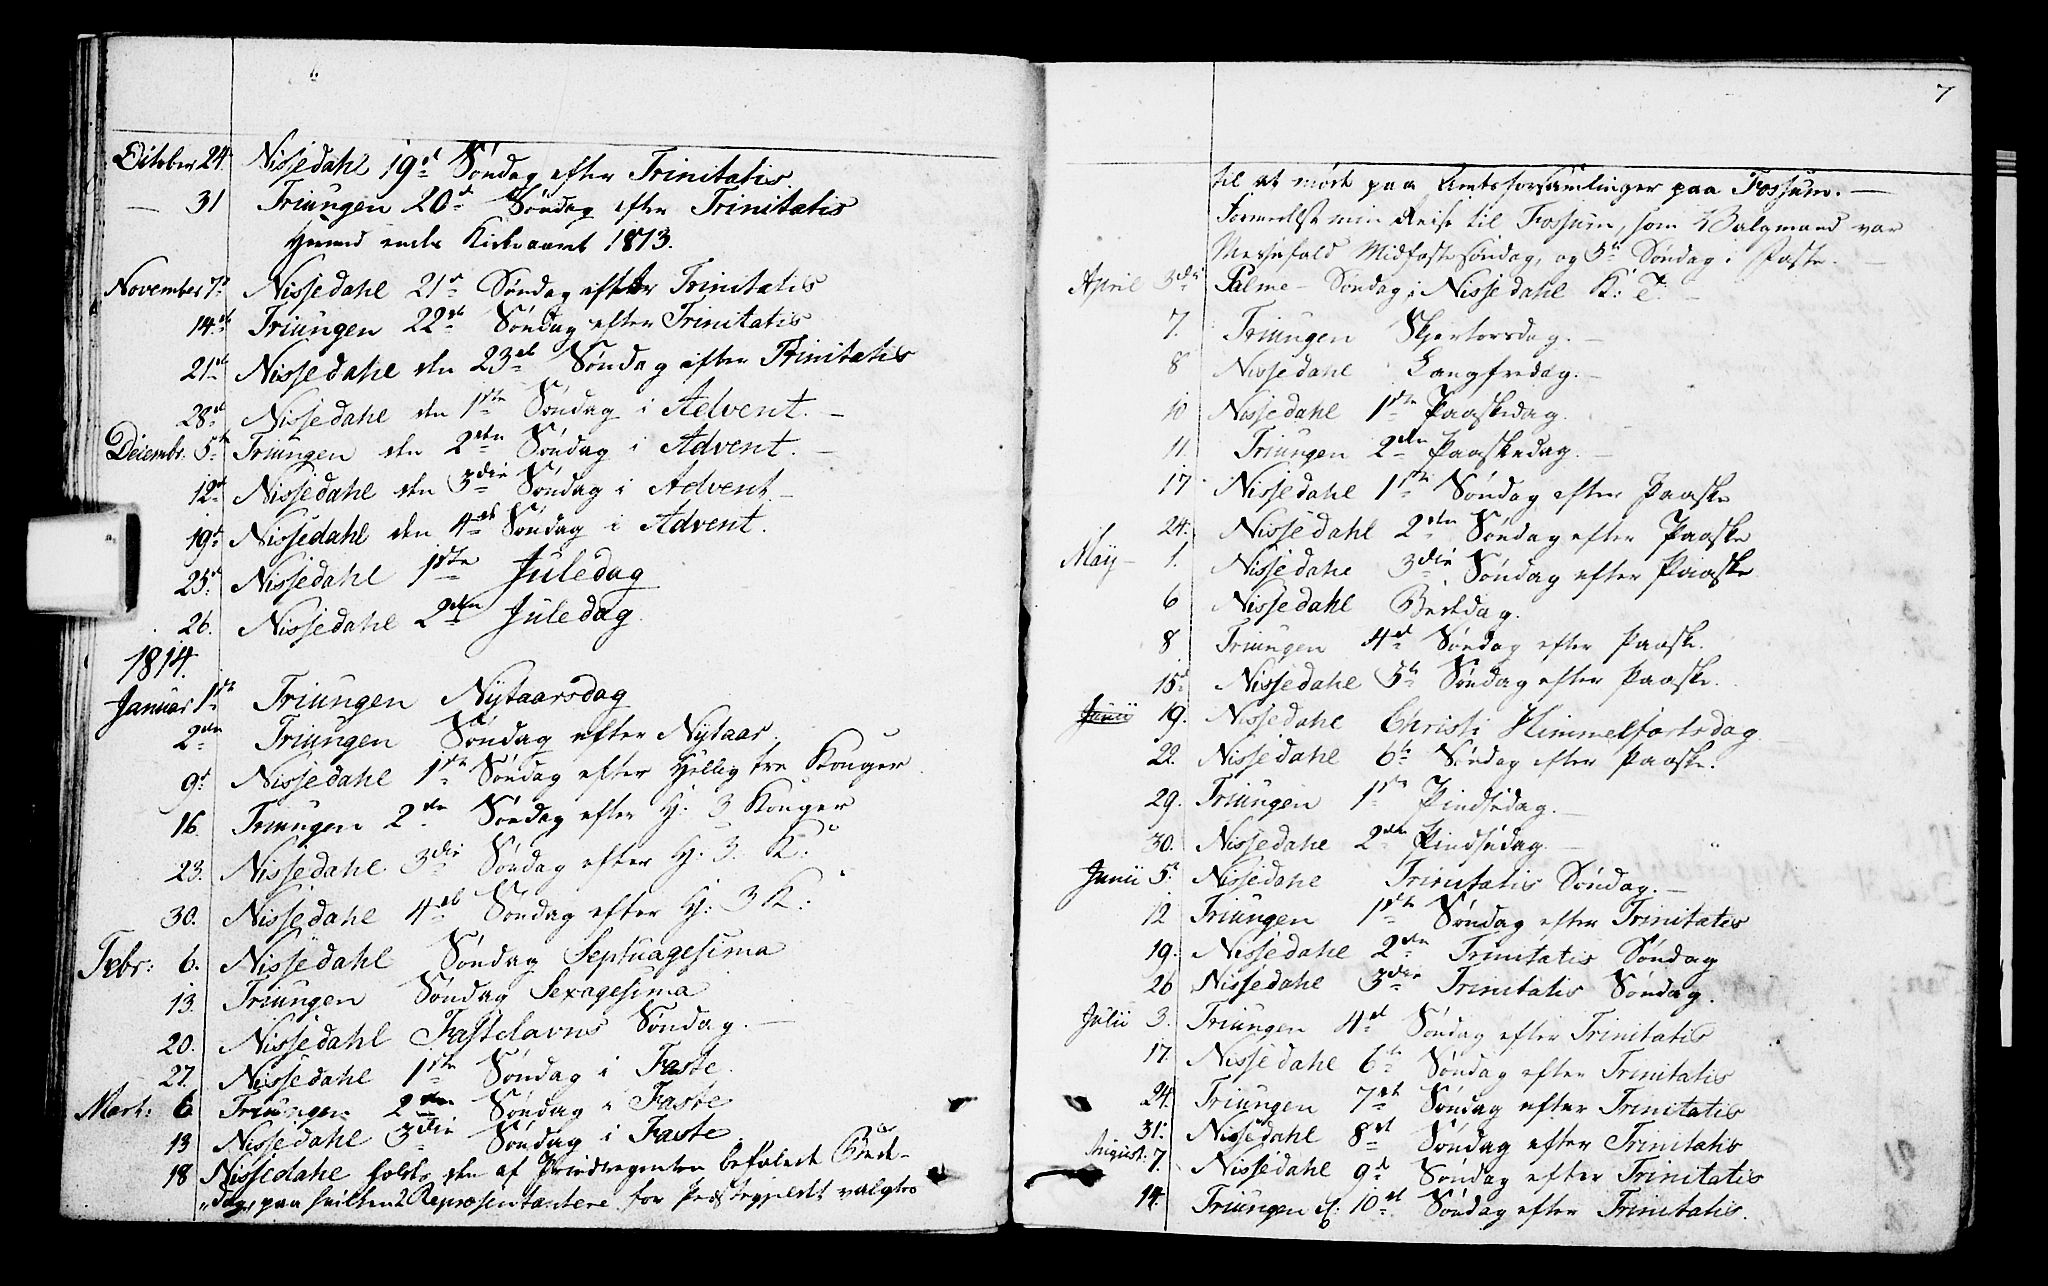 SAKO, Nissedal kirkebøker, F/Fa/L0001: Parish register (official) no. I 1, 1811-1814, p. 7